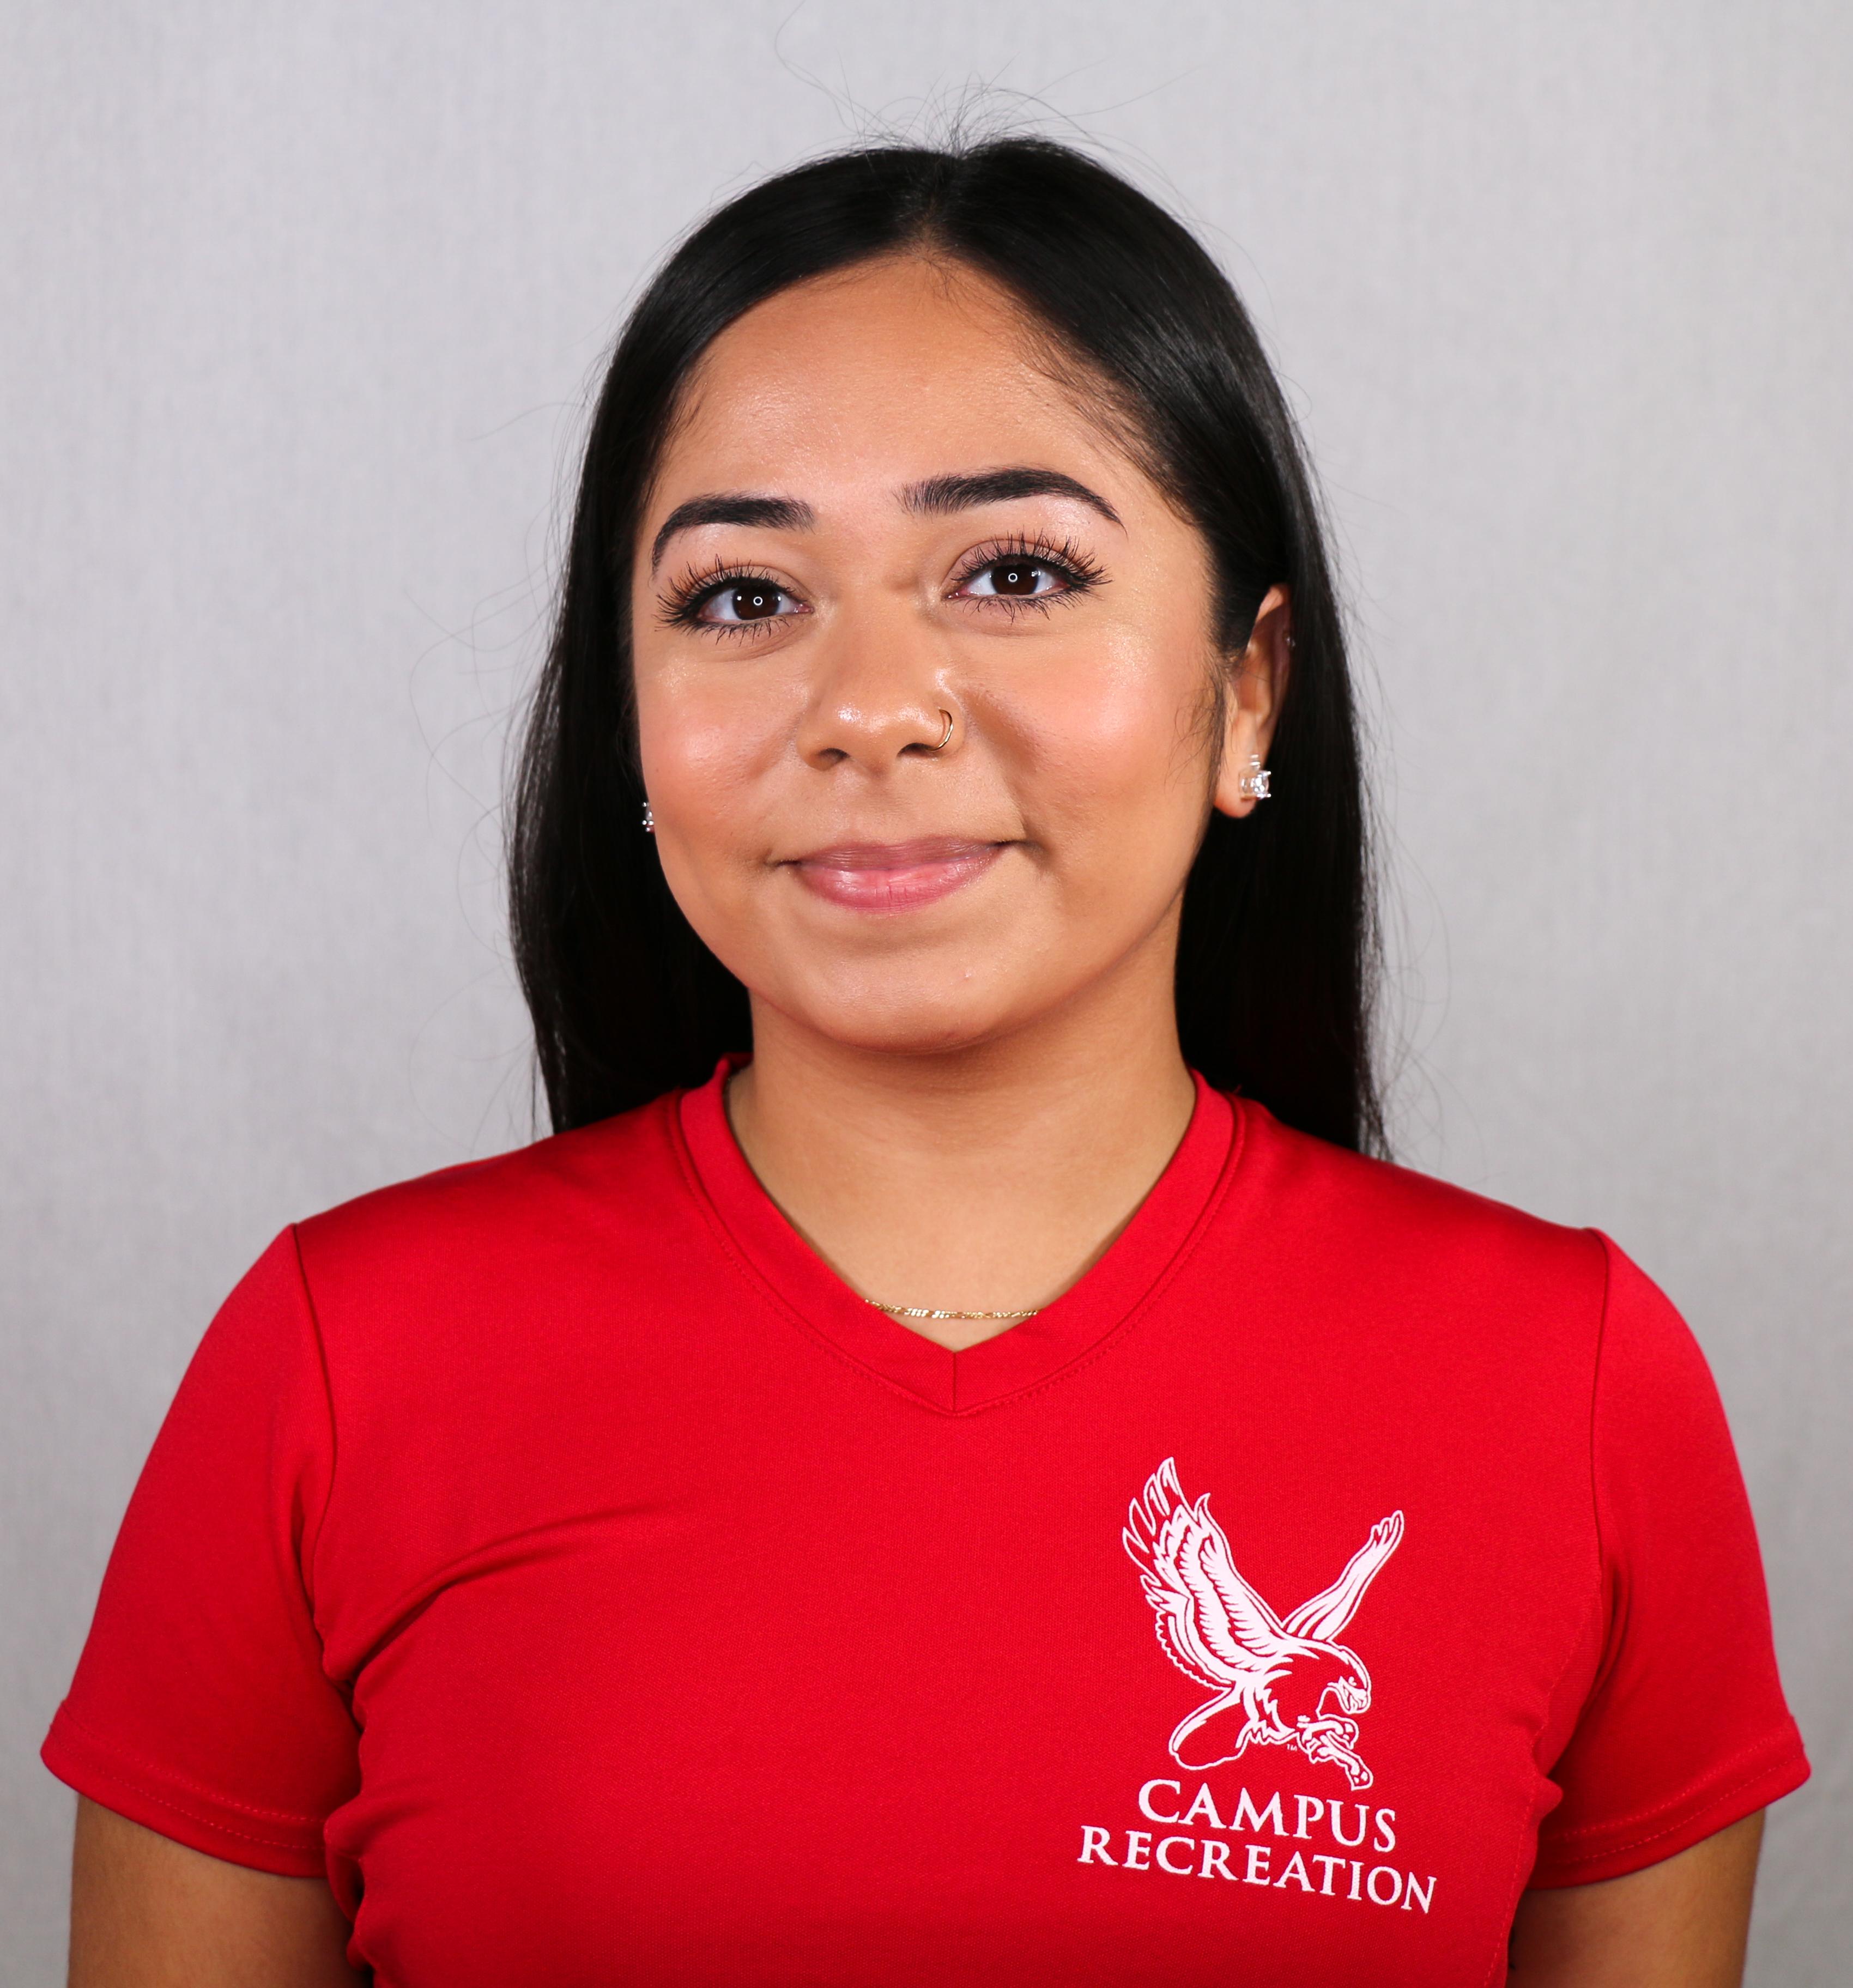 Headshot of Jaela Garcia wearing a red Campus Recreation t-shirt.